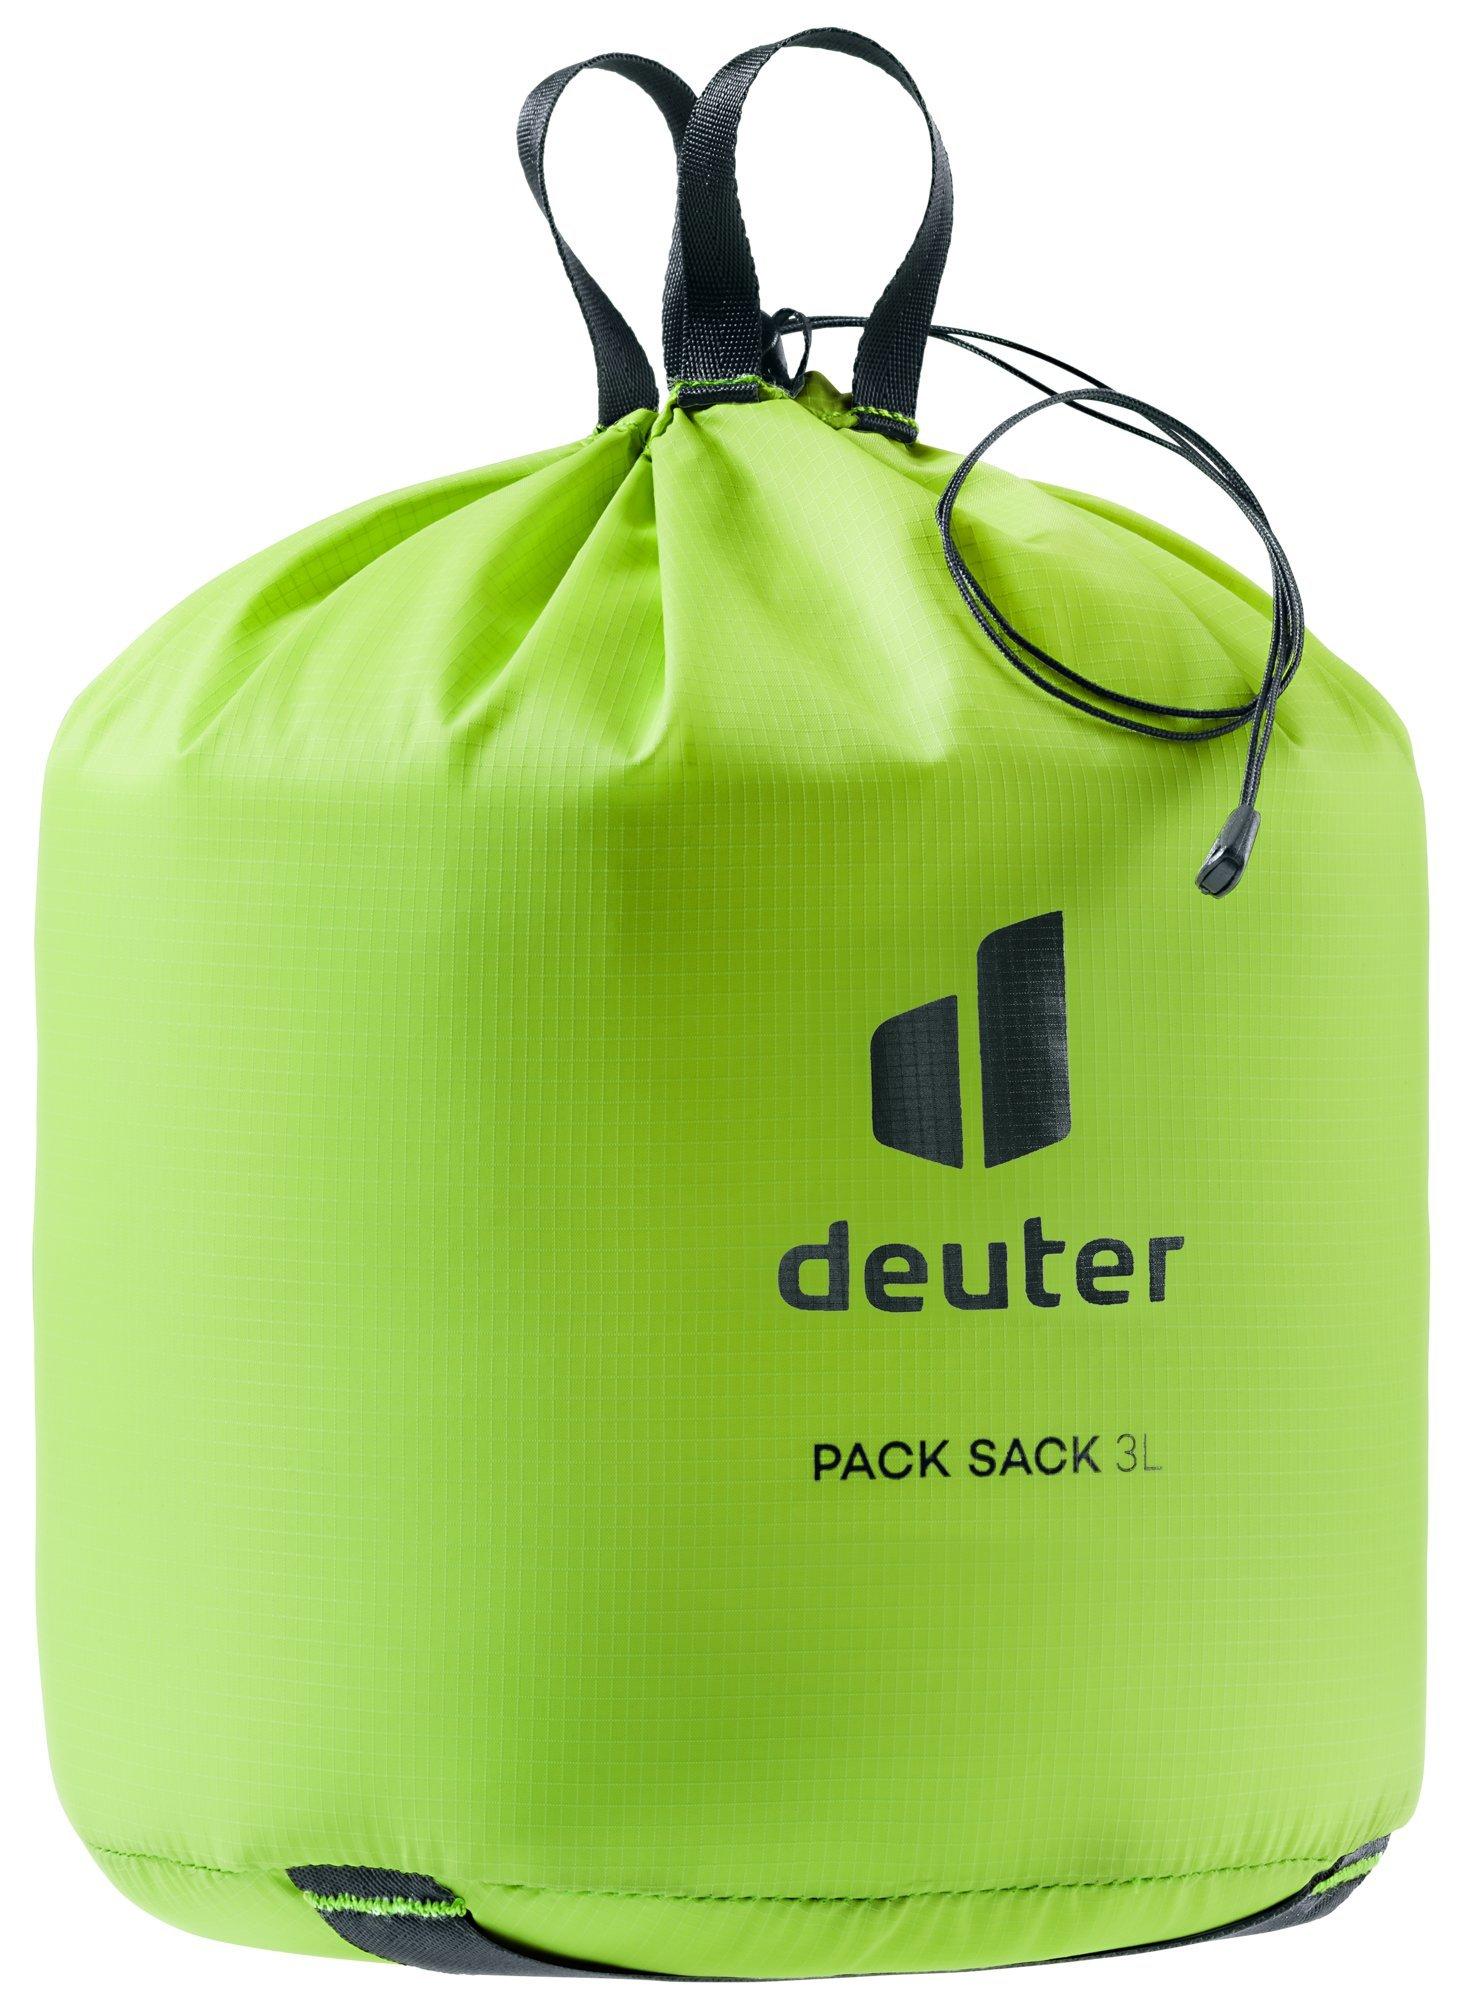 Новинки Упаковочный мешок Deuter Pack Sack 3 (2021) 3941021-8006-PackSack3-w20-d0.jpg